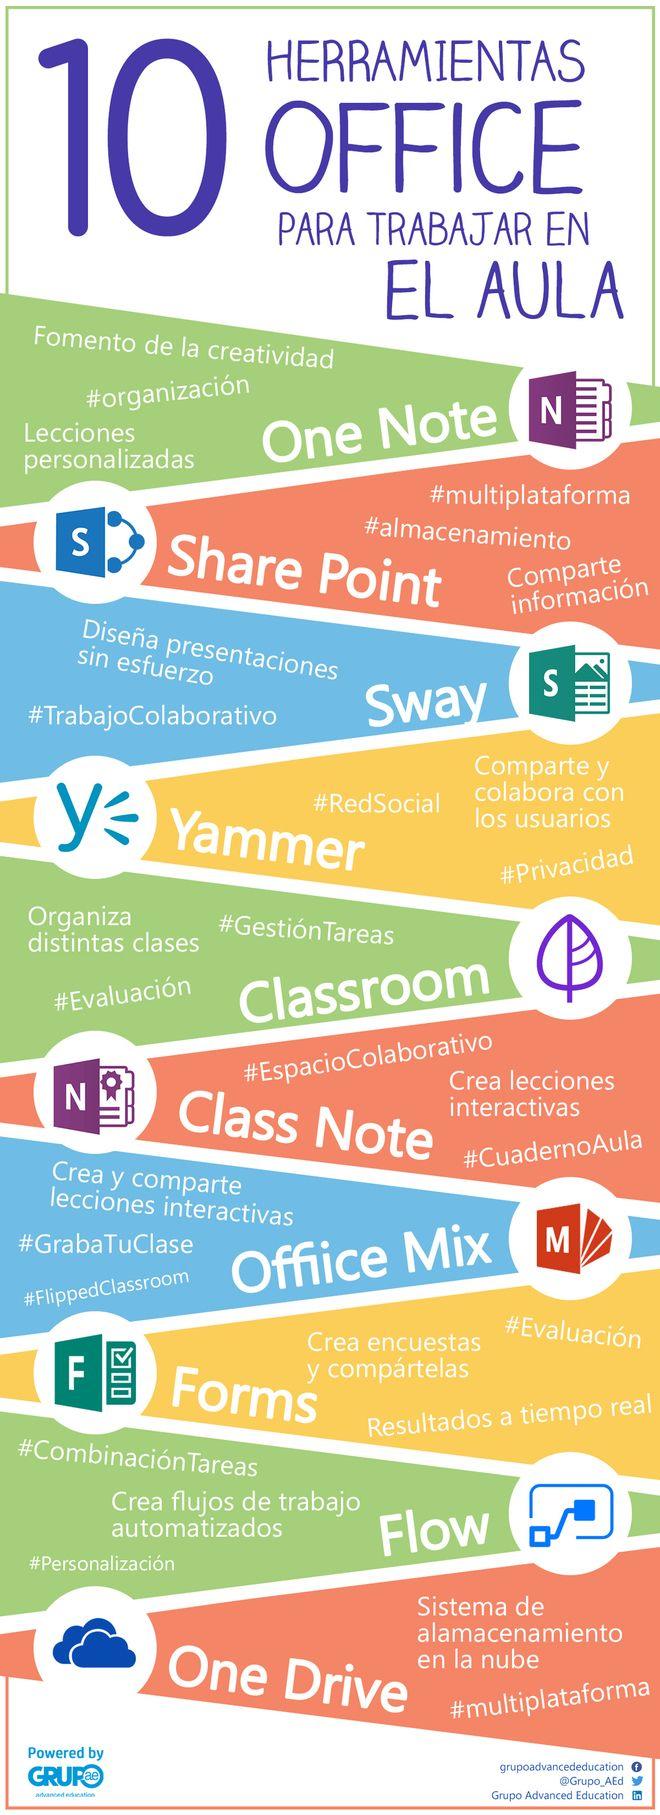 Apps para Flipped Classroom on Herramientas TIC curated by Patricia Hidalgo Murciano